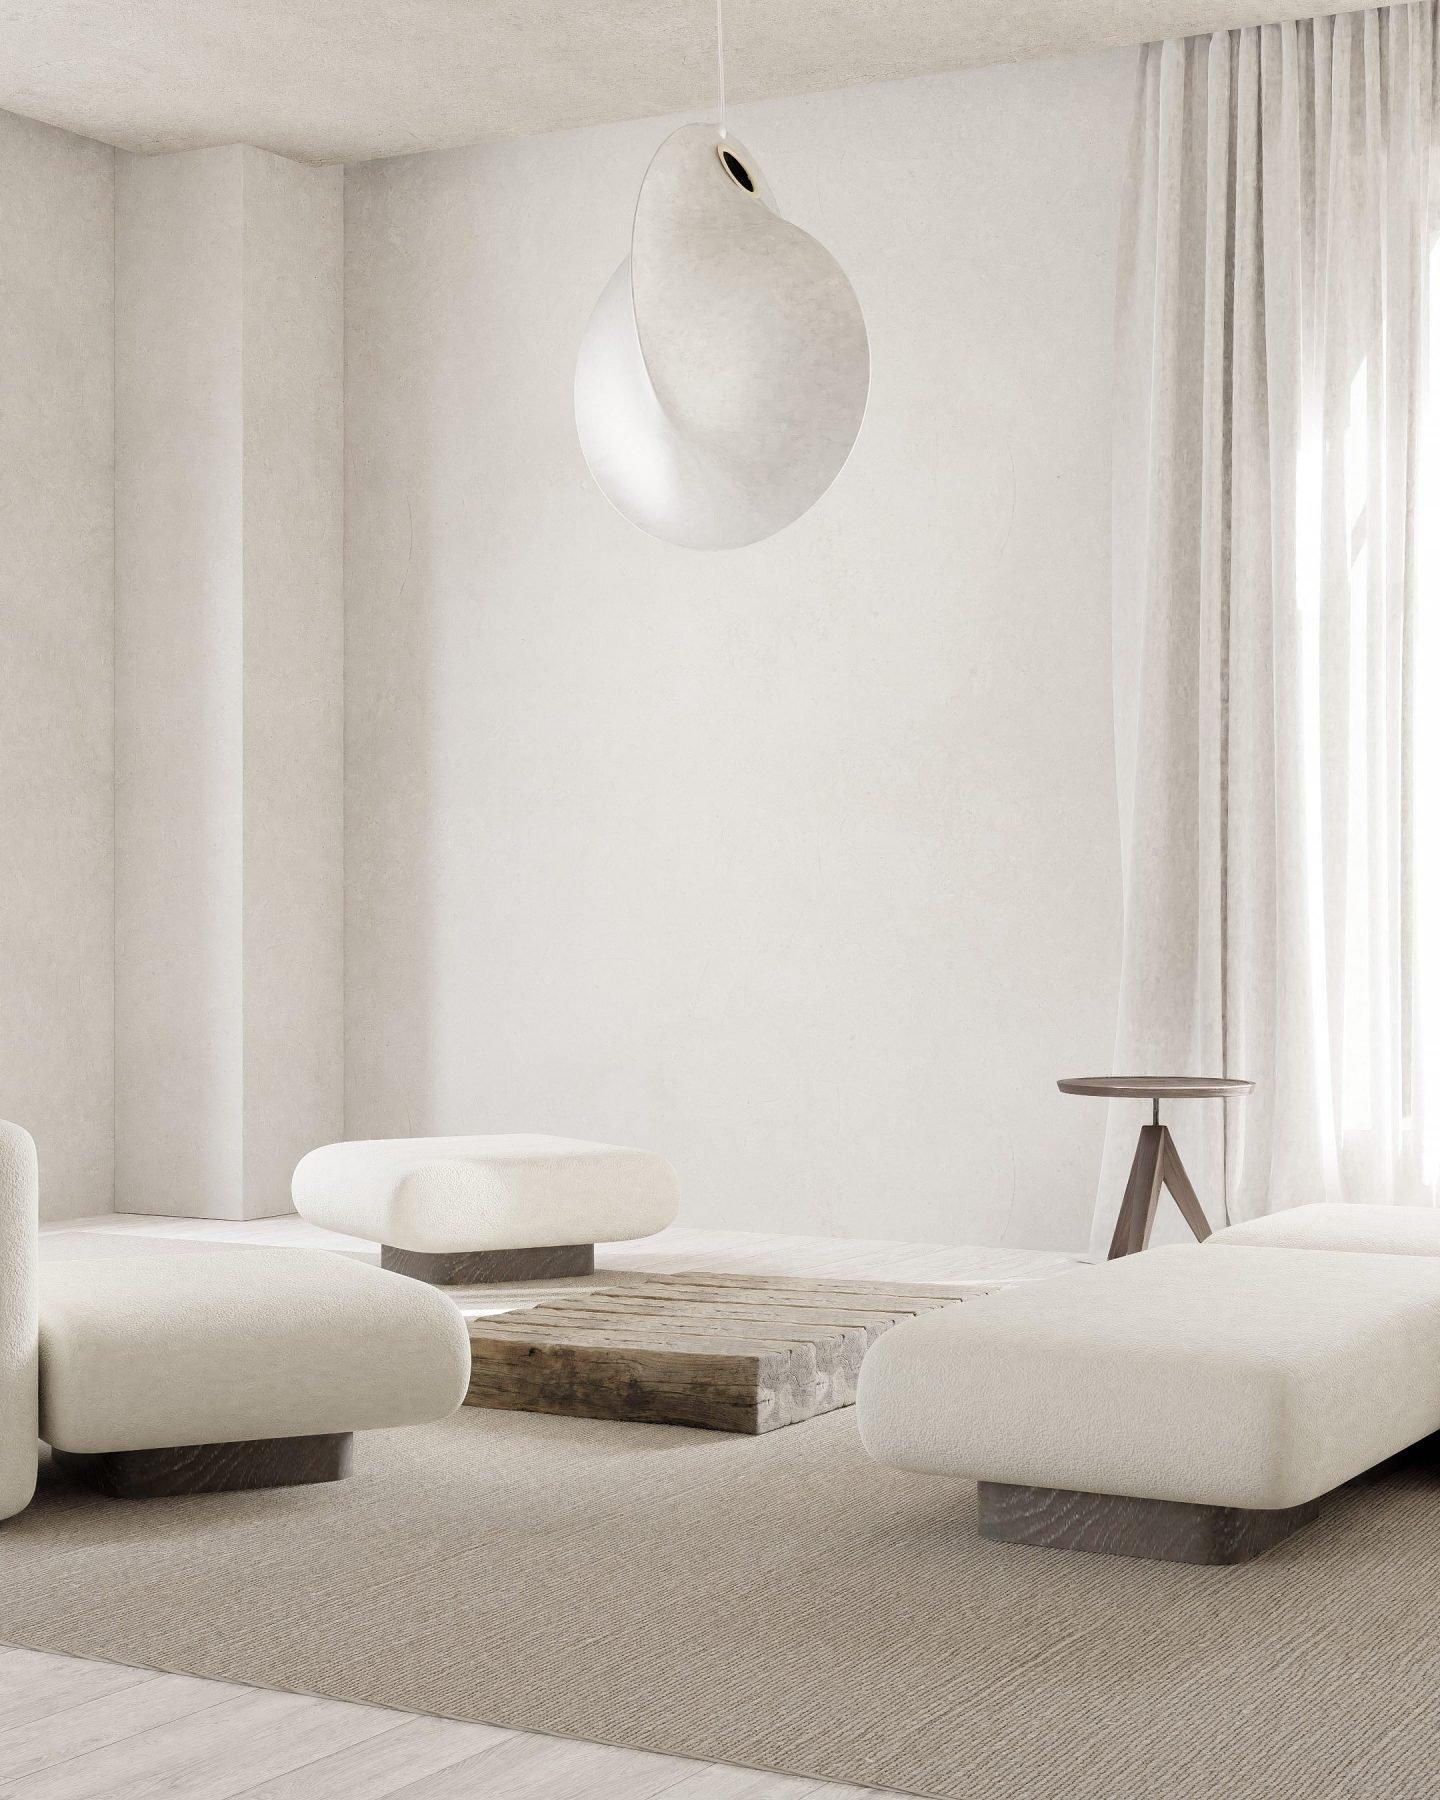 IGNANT-Design-Interview-Osminina-14